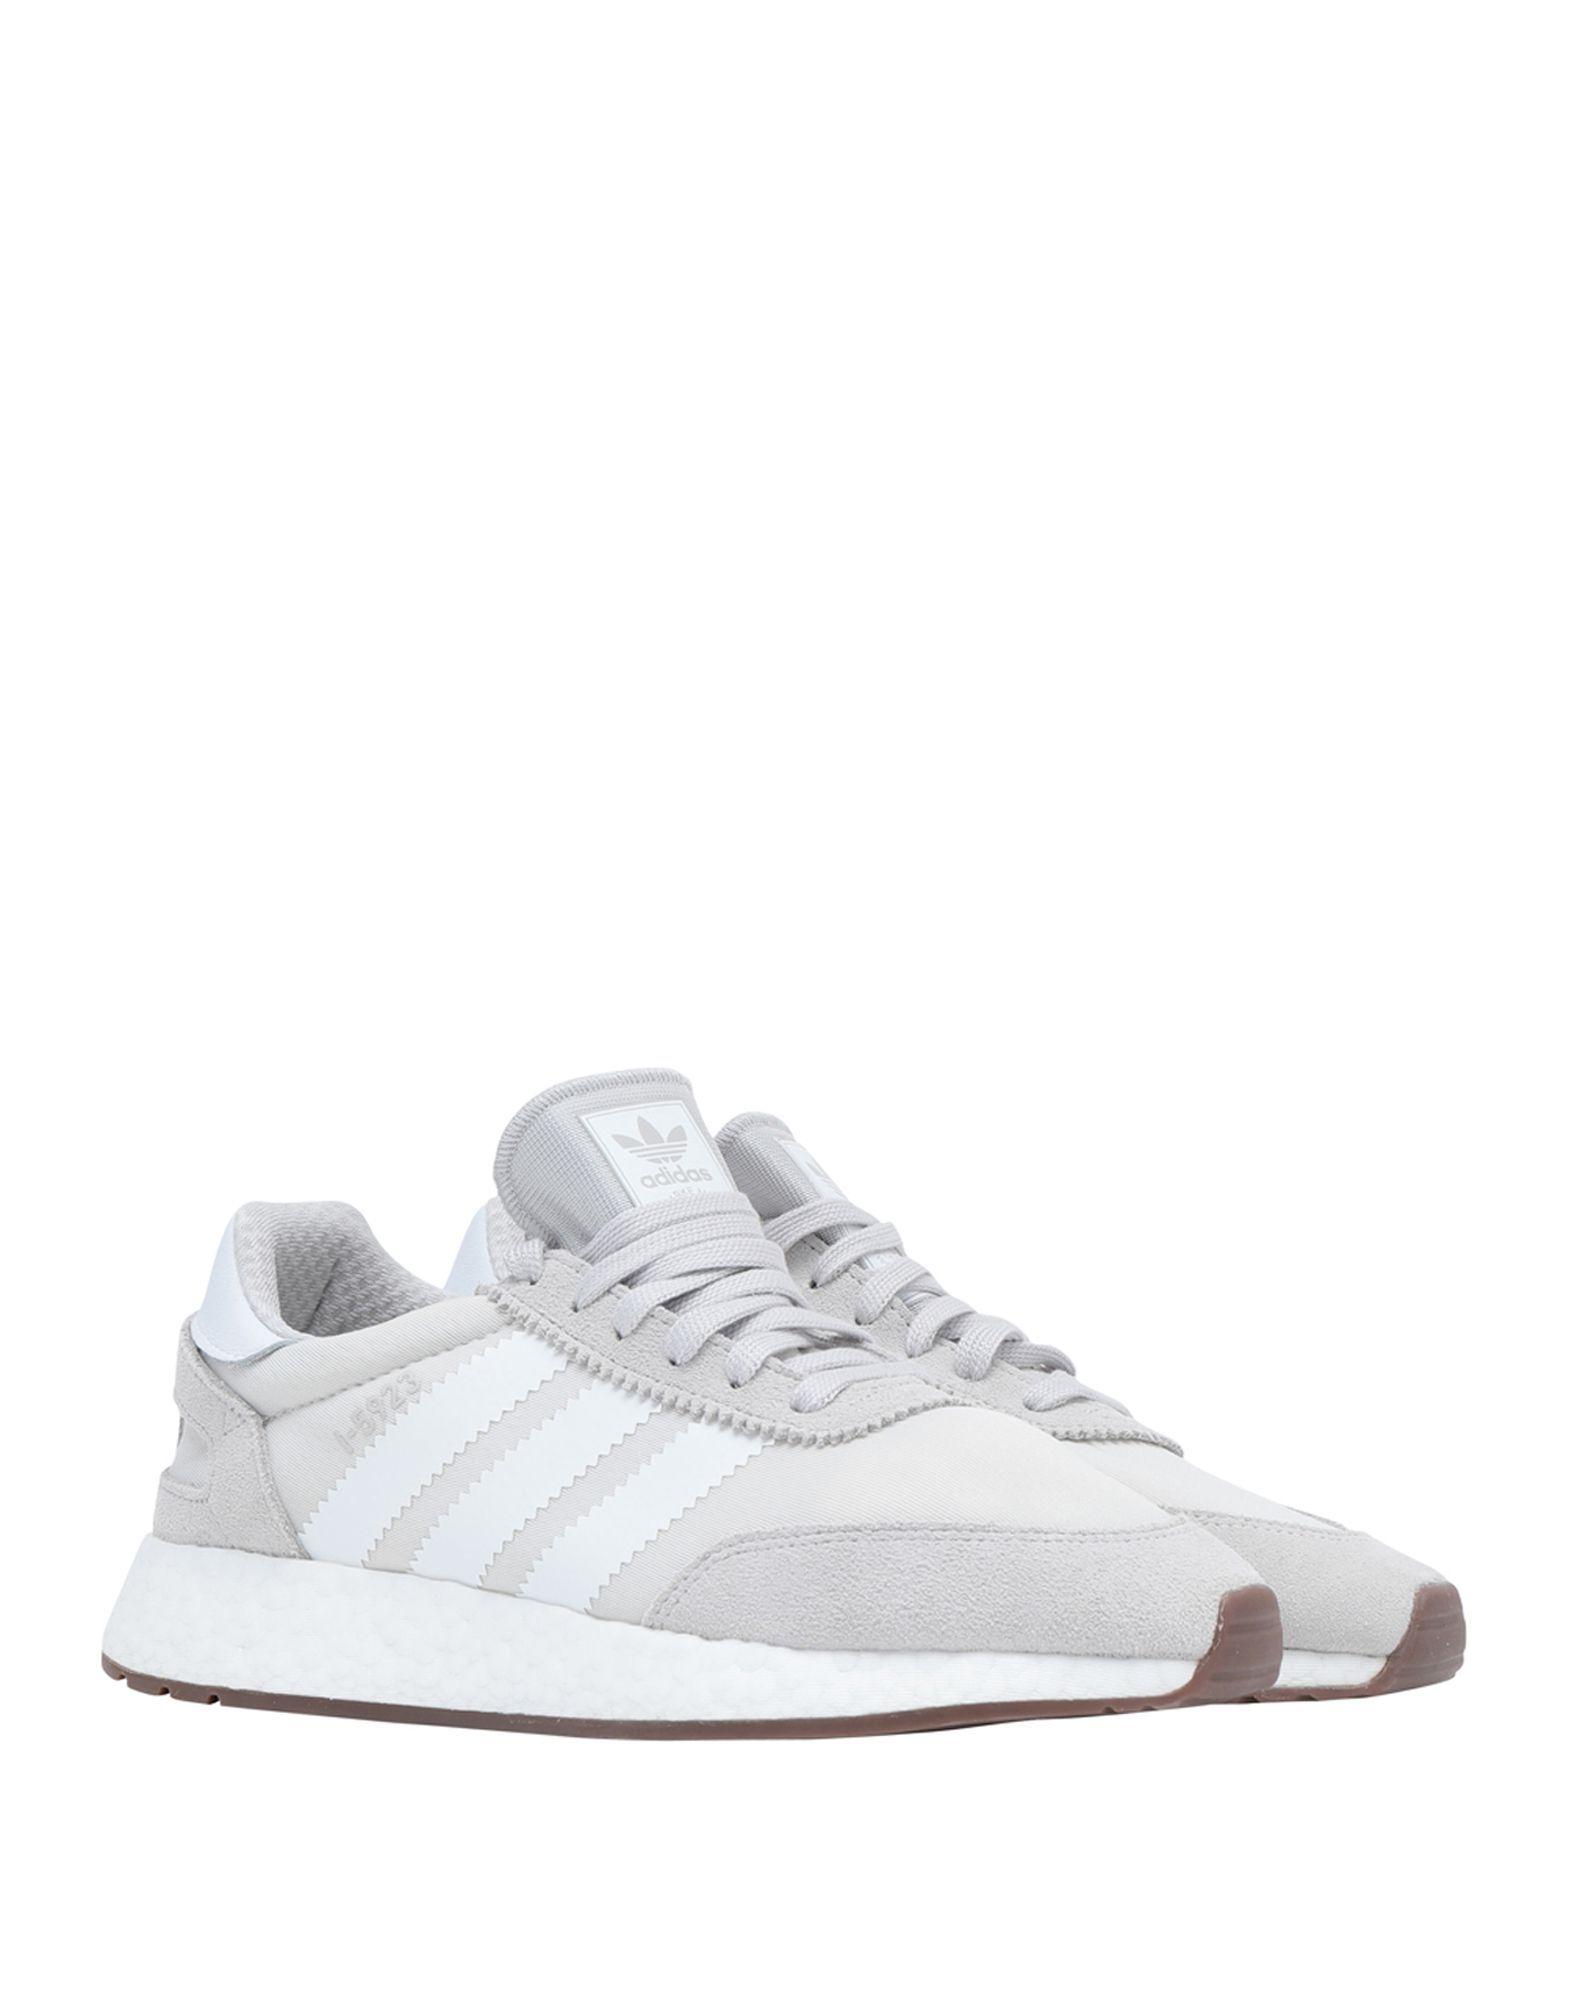 Adidas Originals Light Grey Leather Sneakers